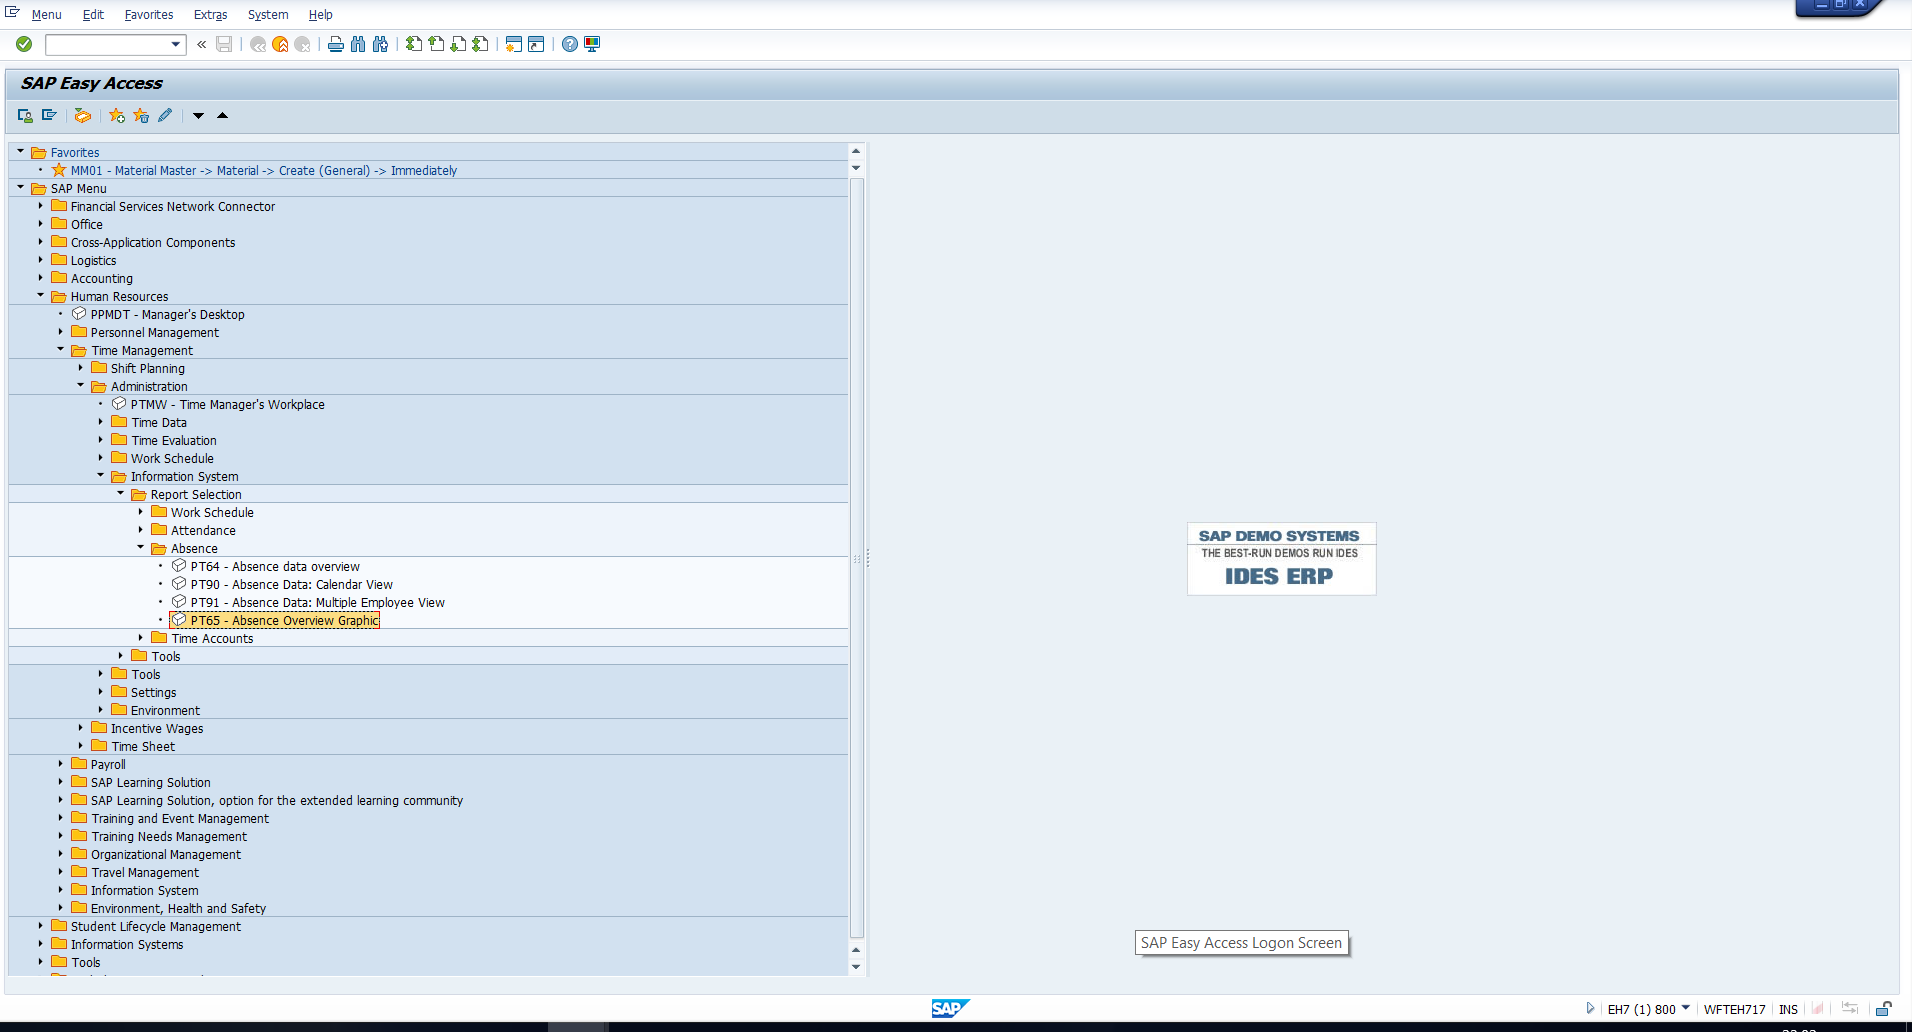 Figure 16: SAP Easy Access Path